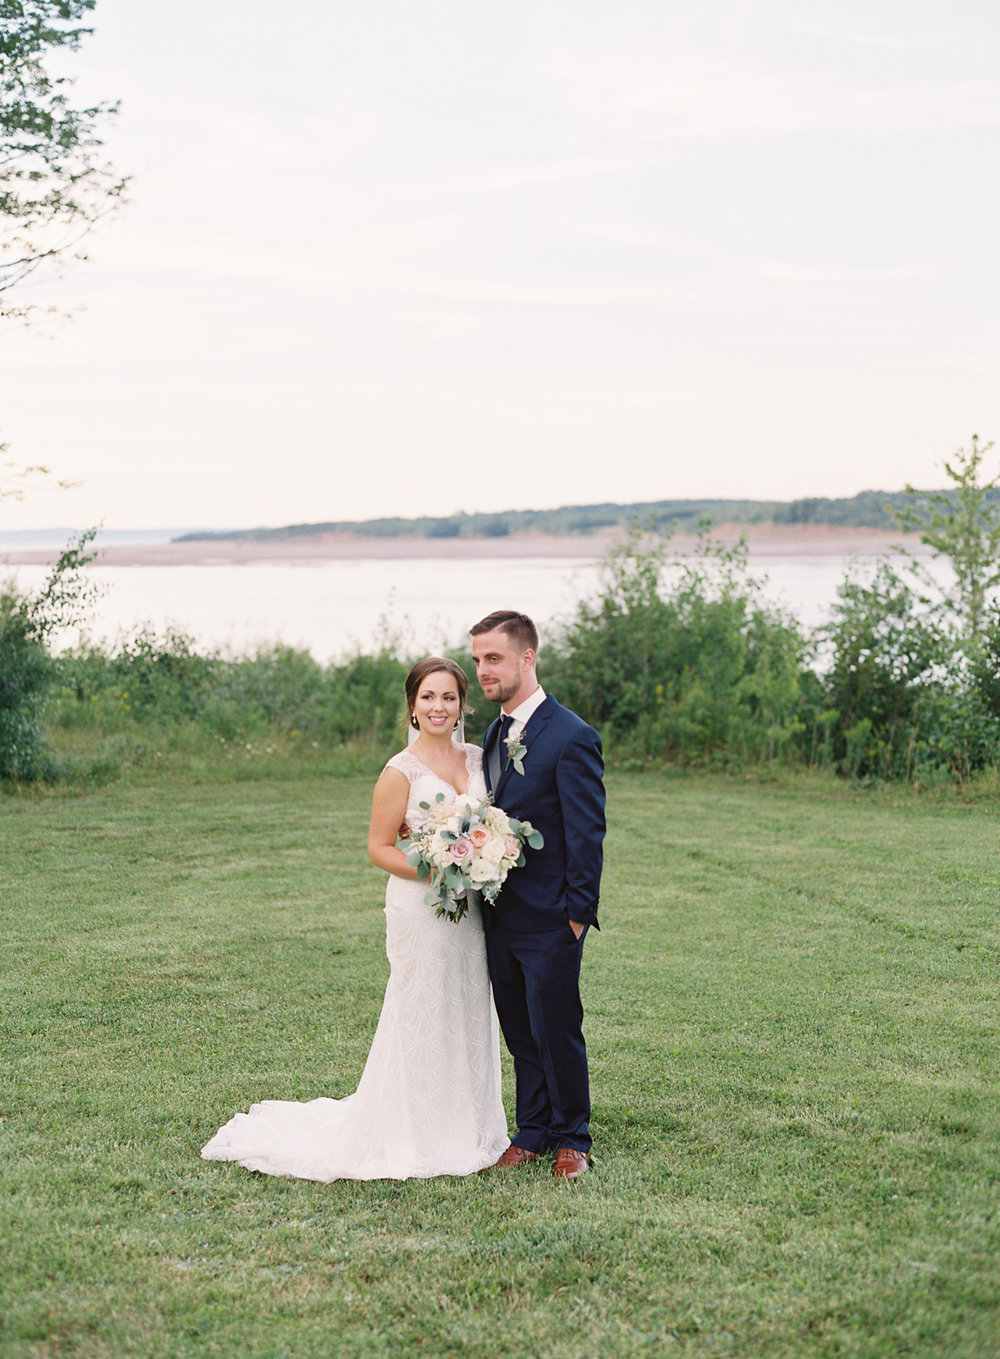 Jacqueline Anne Photography - Nova Scotia Backyard Wedding-83.jpg